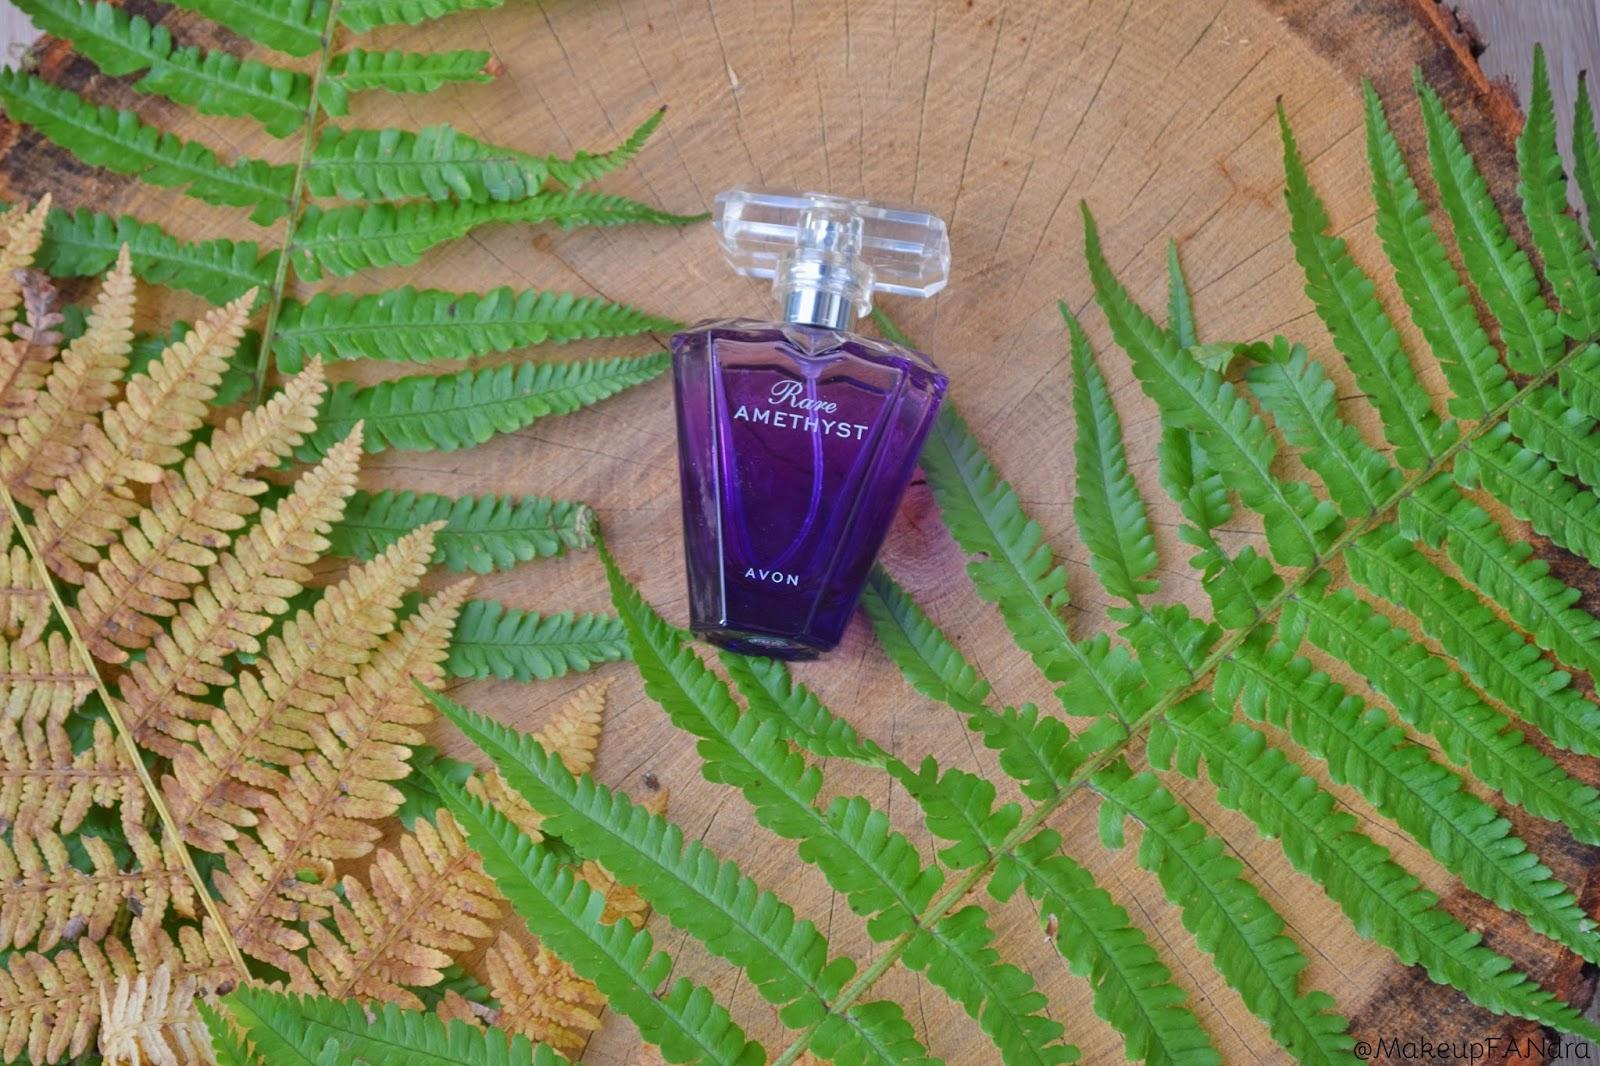 Avon Rare Amethyst parfem recenzija